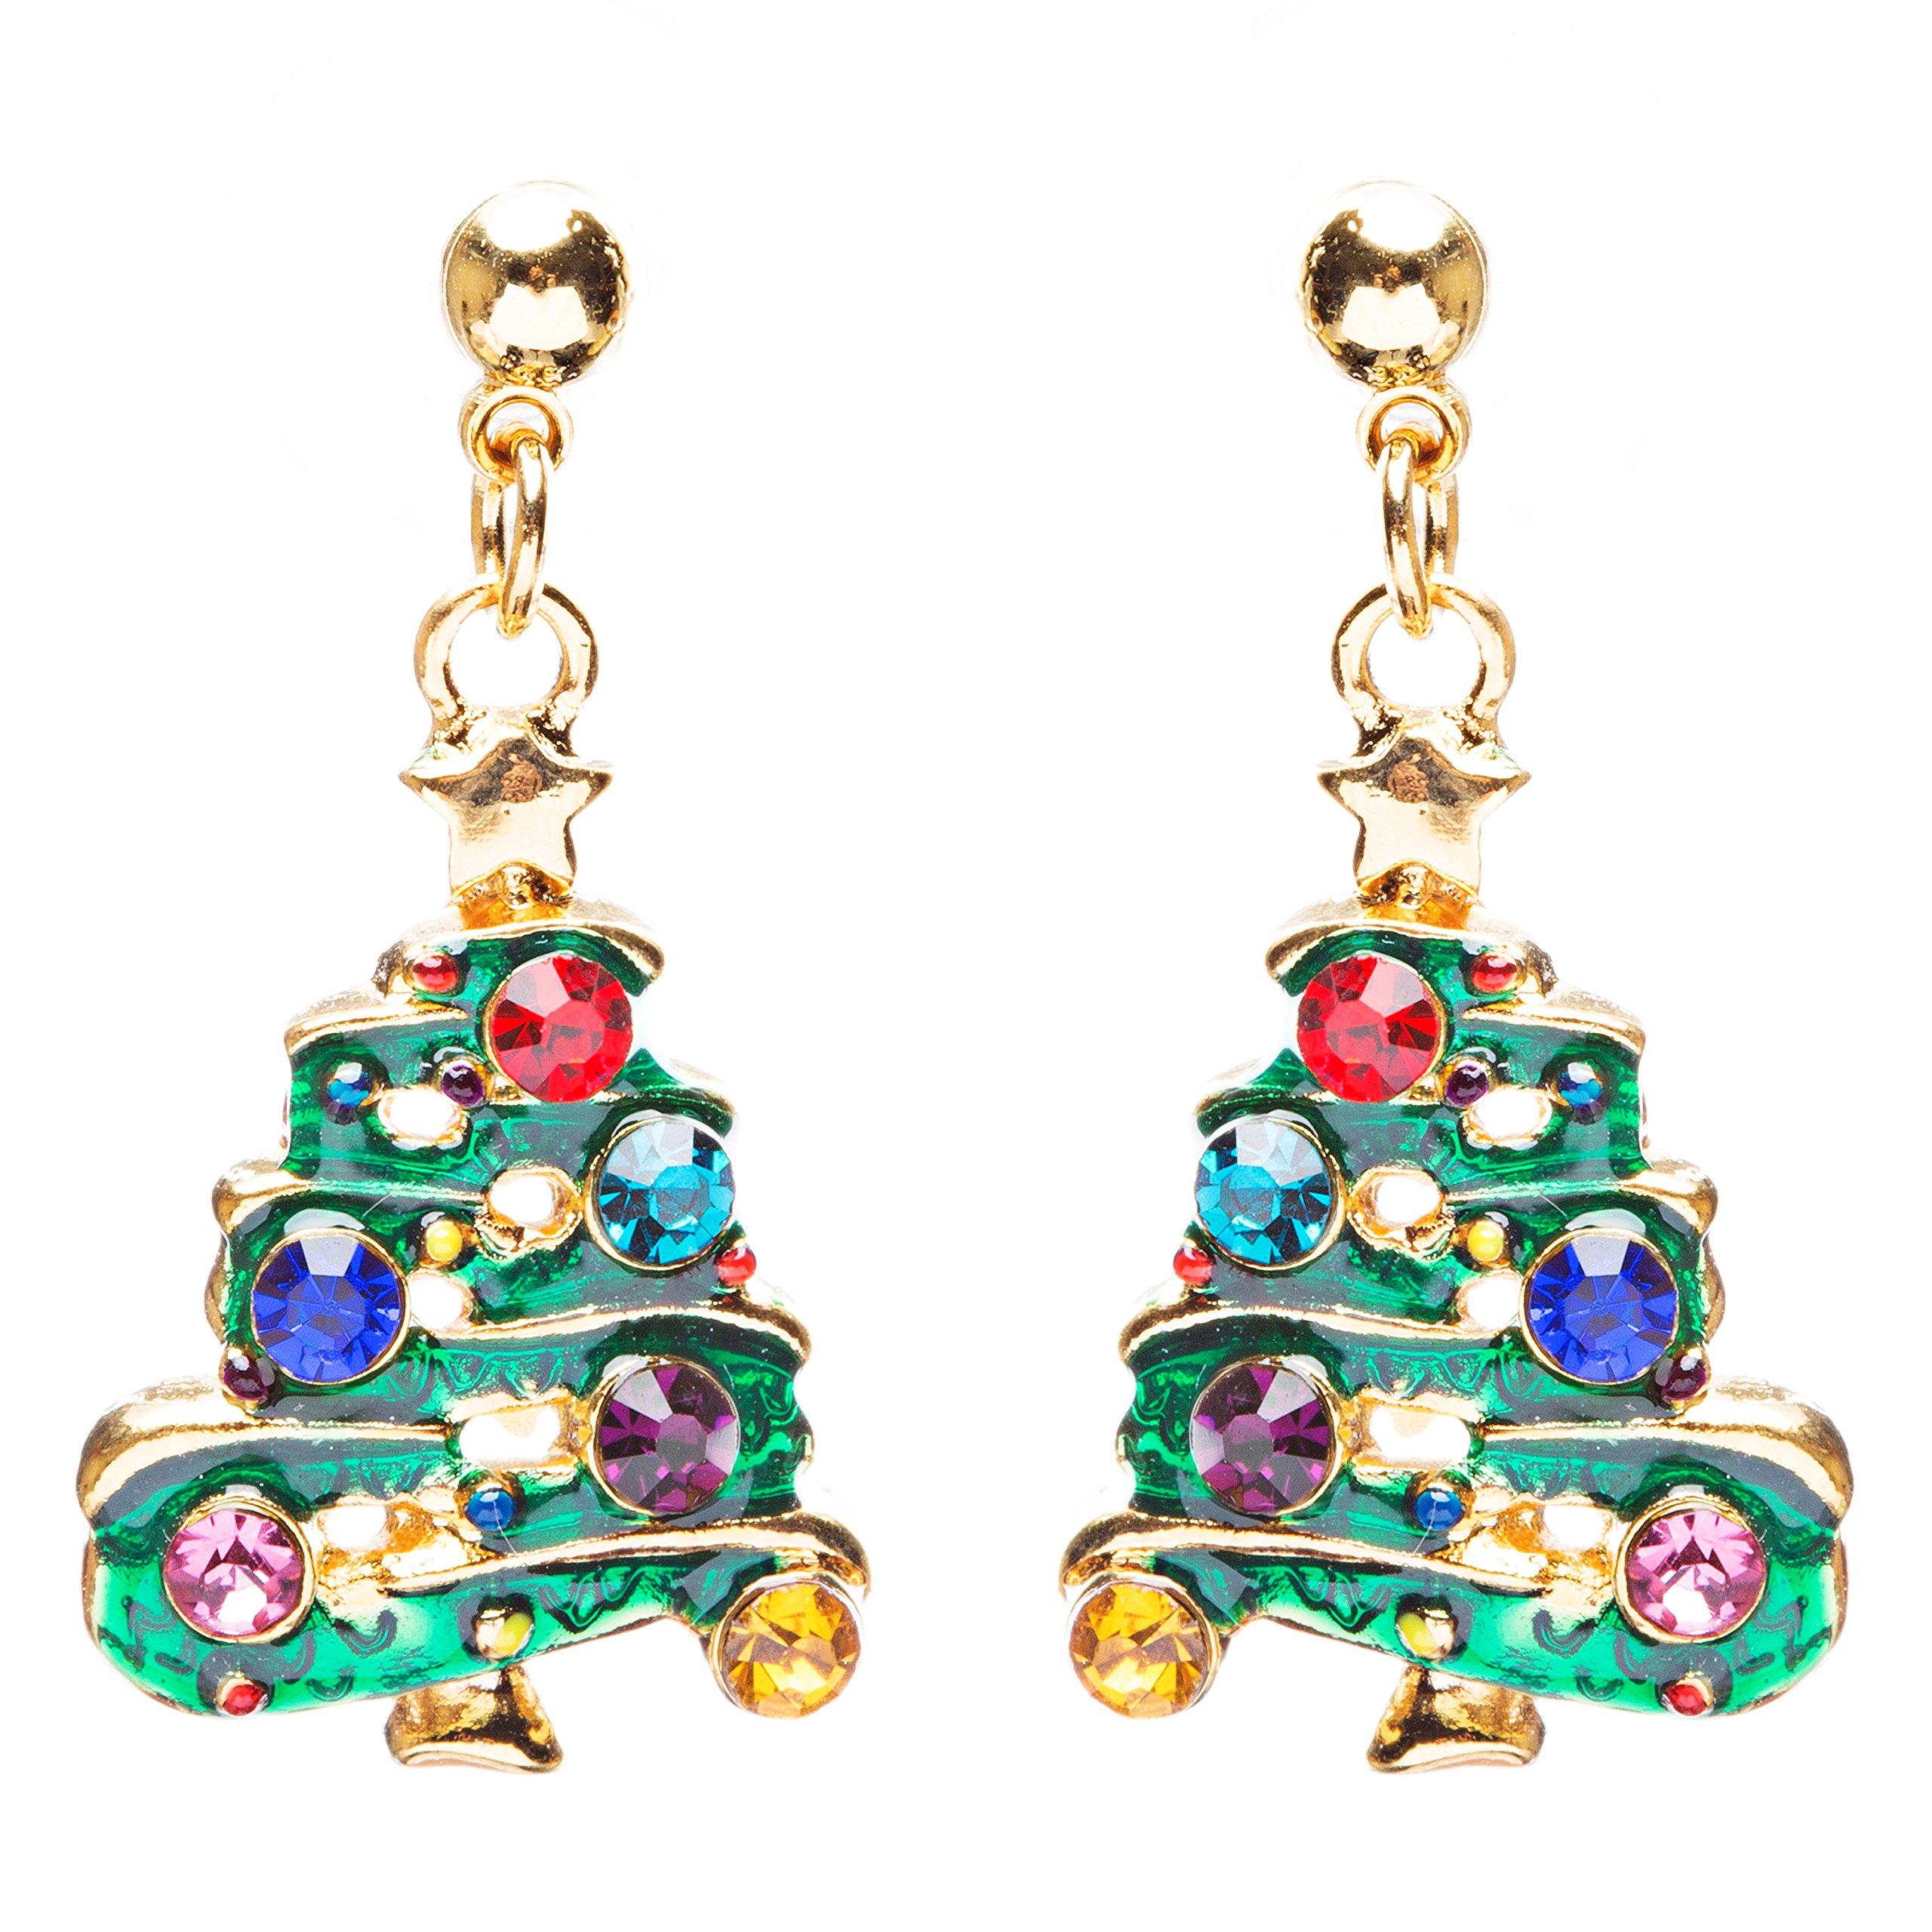 ACCESSORIESFOREVER Women Christmas Jewelry Crystal Rhinestone Tree Dangle Charm Earrings E881 Green